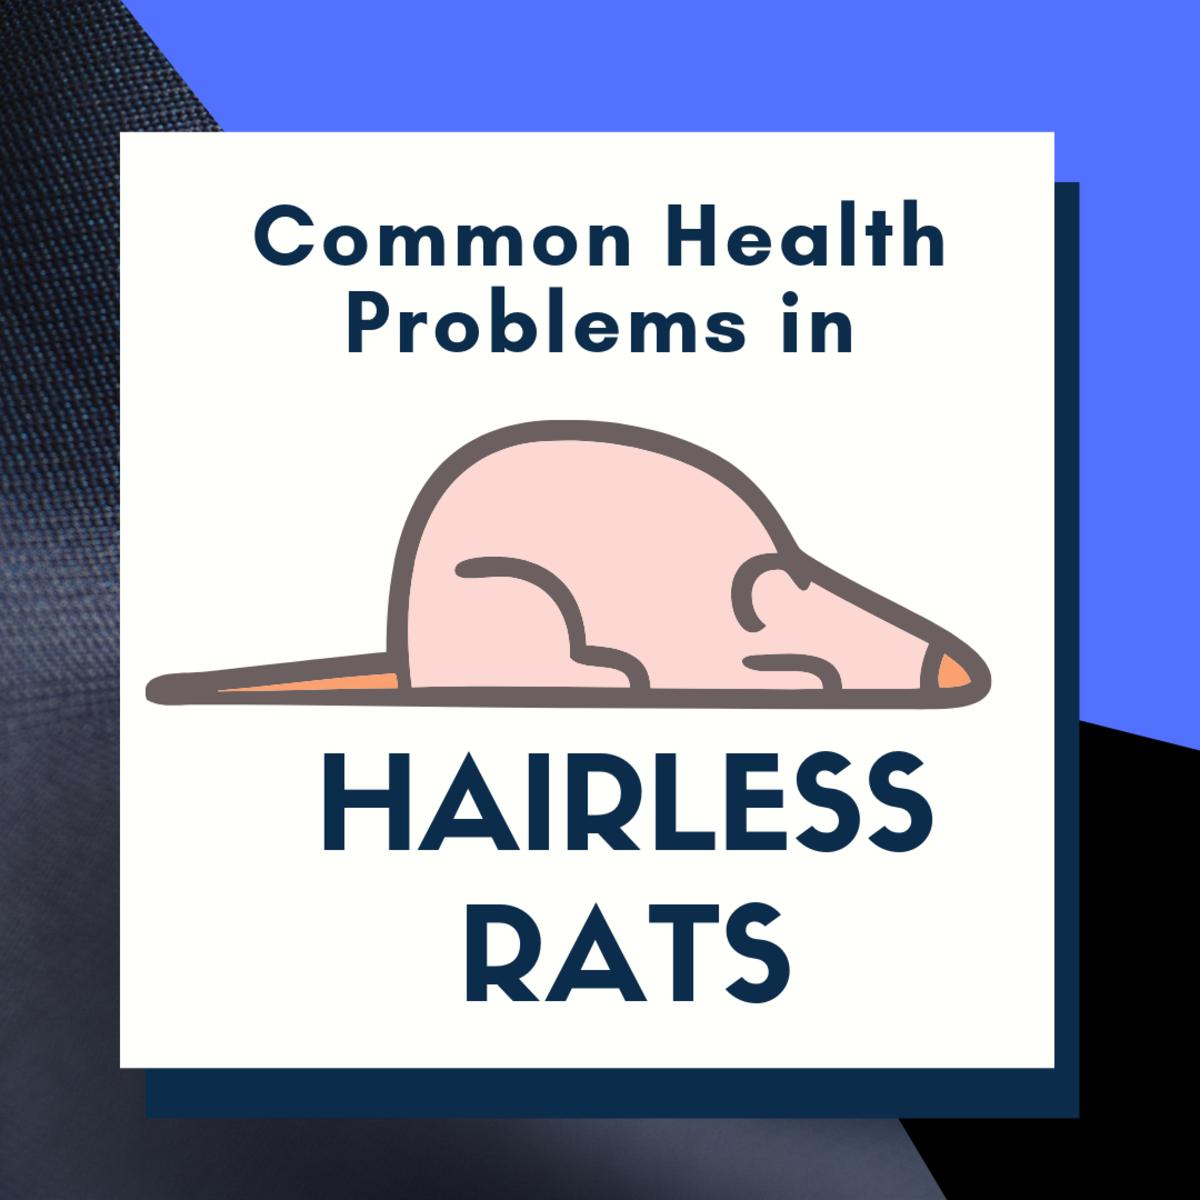 Common Hairless Rat Health Problems